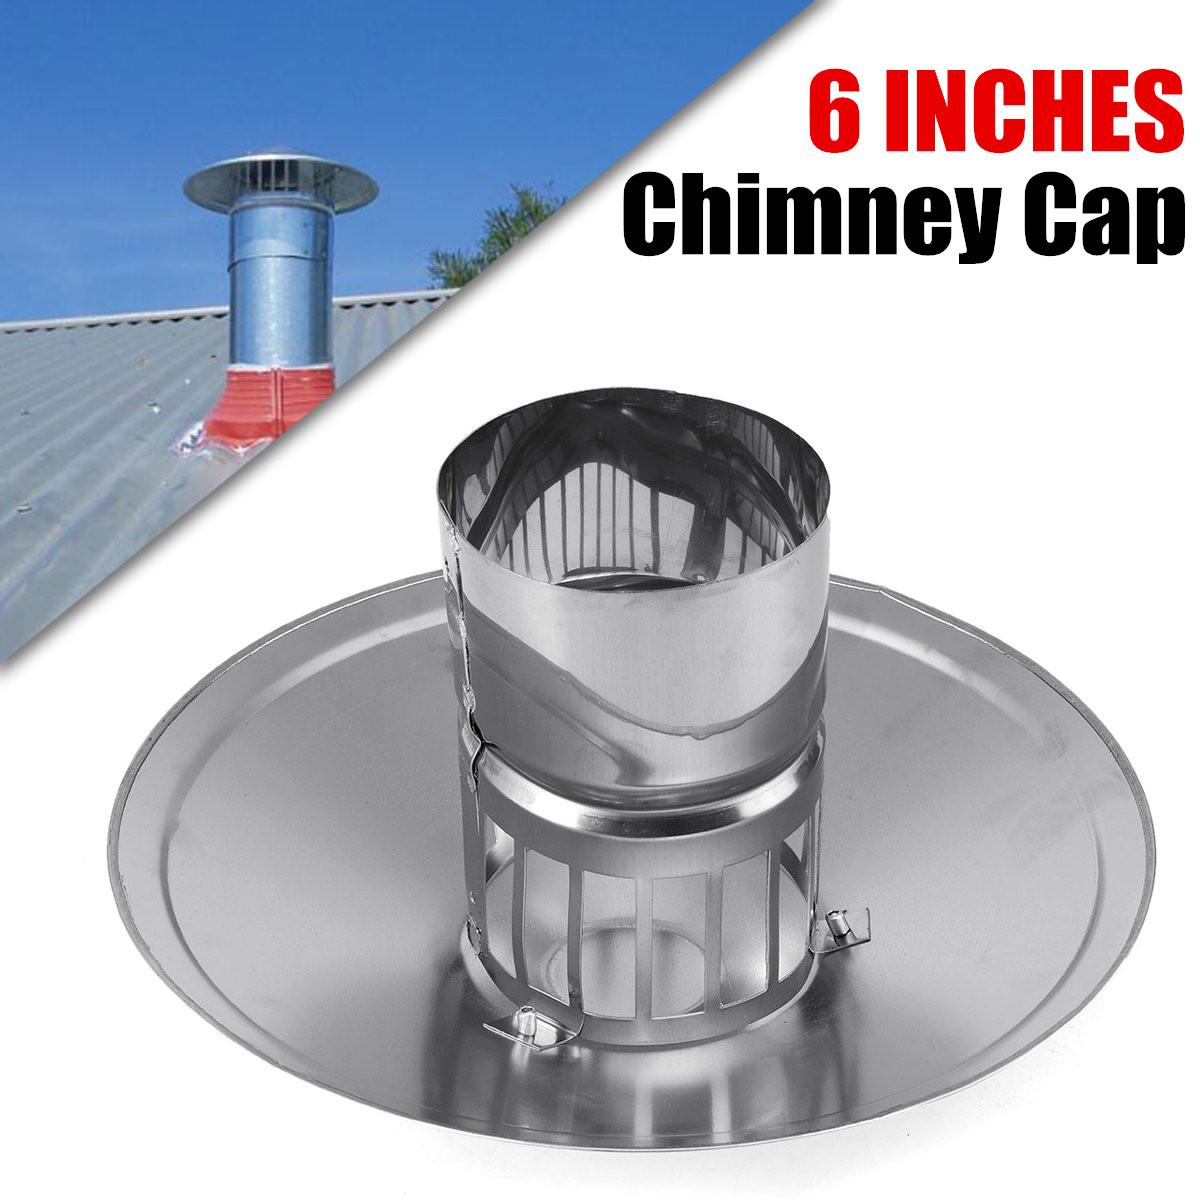 6inch stove pipe chimney cap galvanized iron mushroom shaped roof multi flue ventilation us roof weatherproof smoke stack cap walmart com